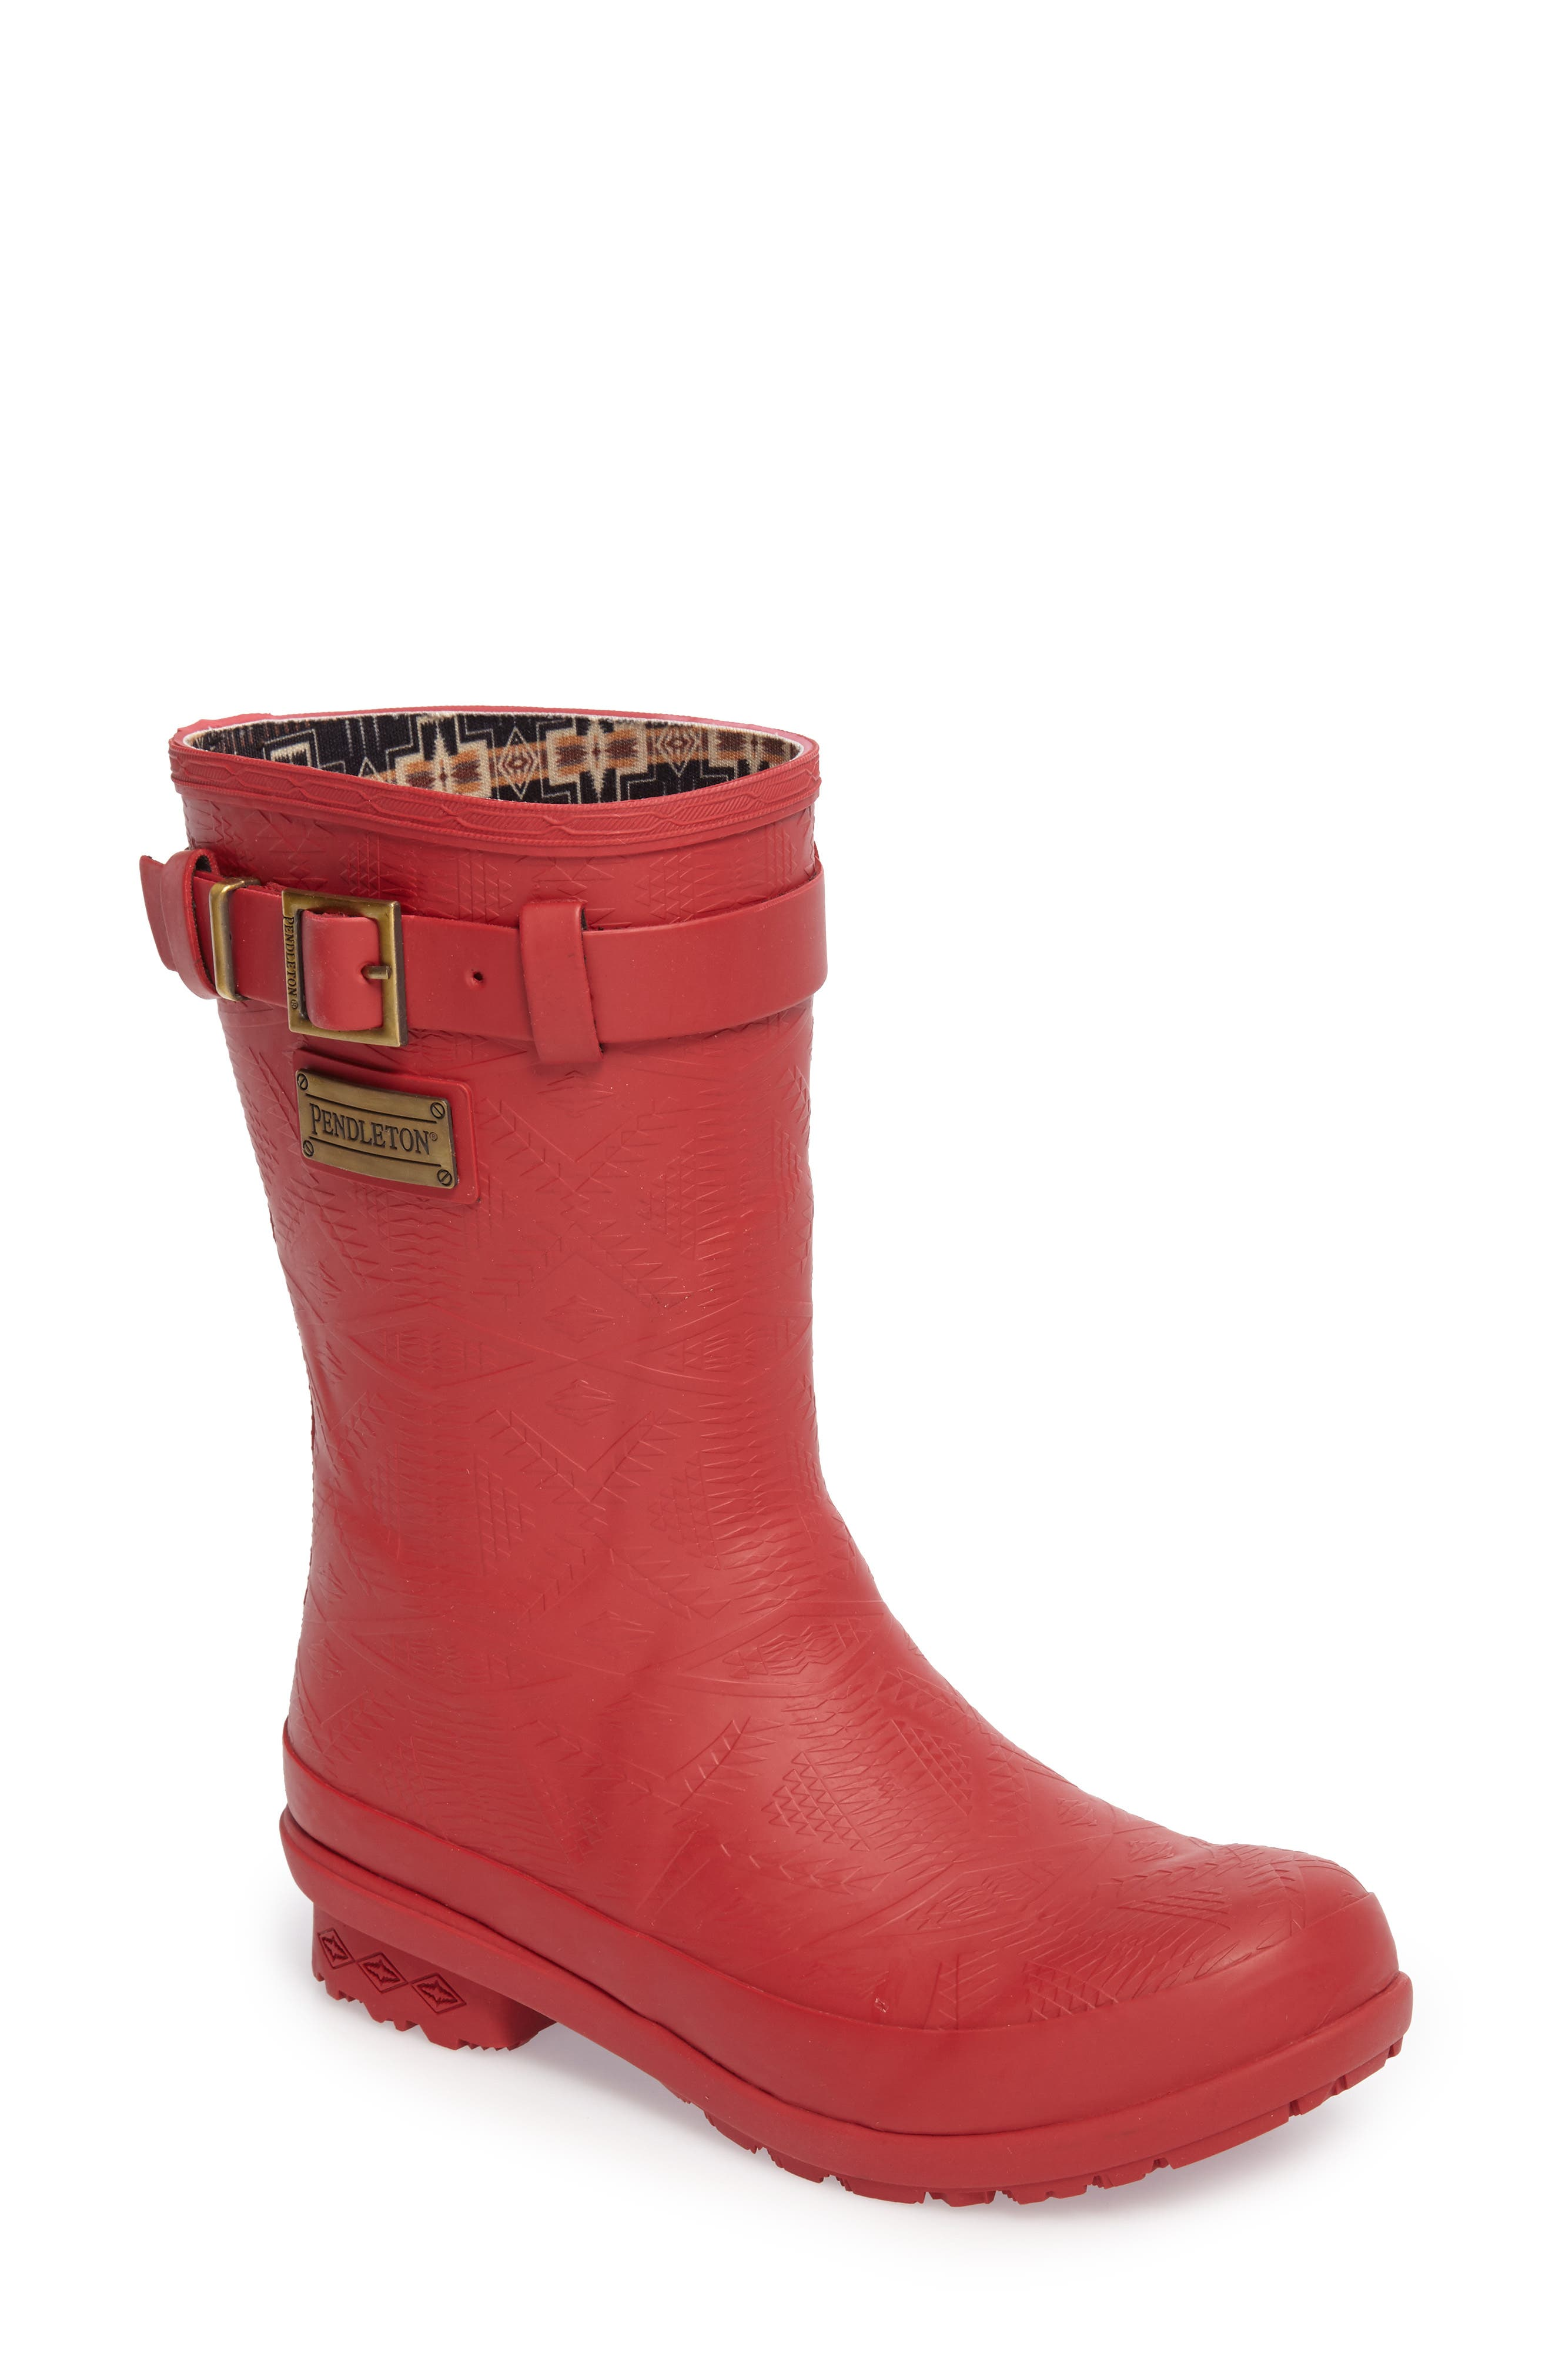 Pendleton Embossed Short Rain Boot,                             Main thumbnail 1, color,                             Scarlet